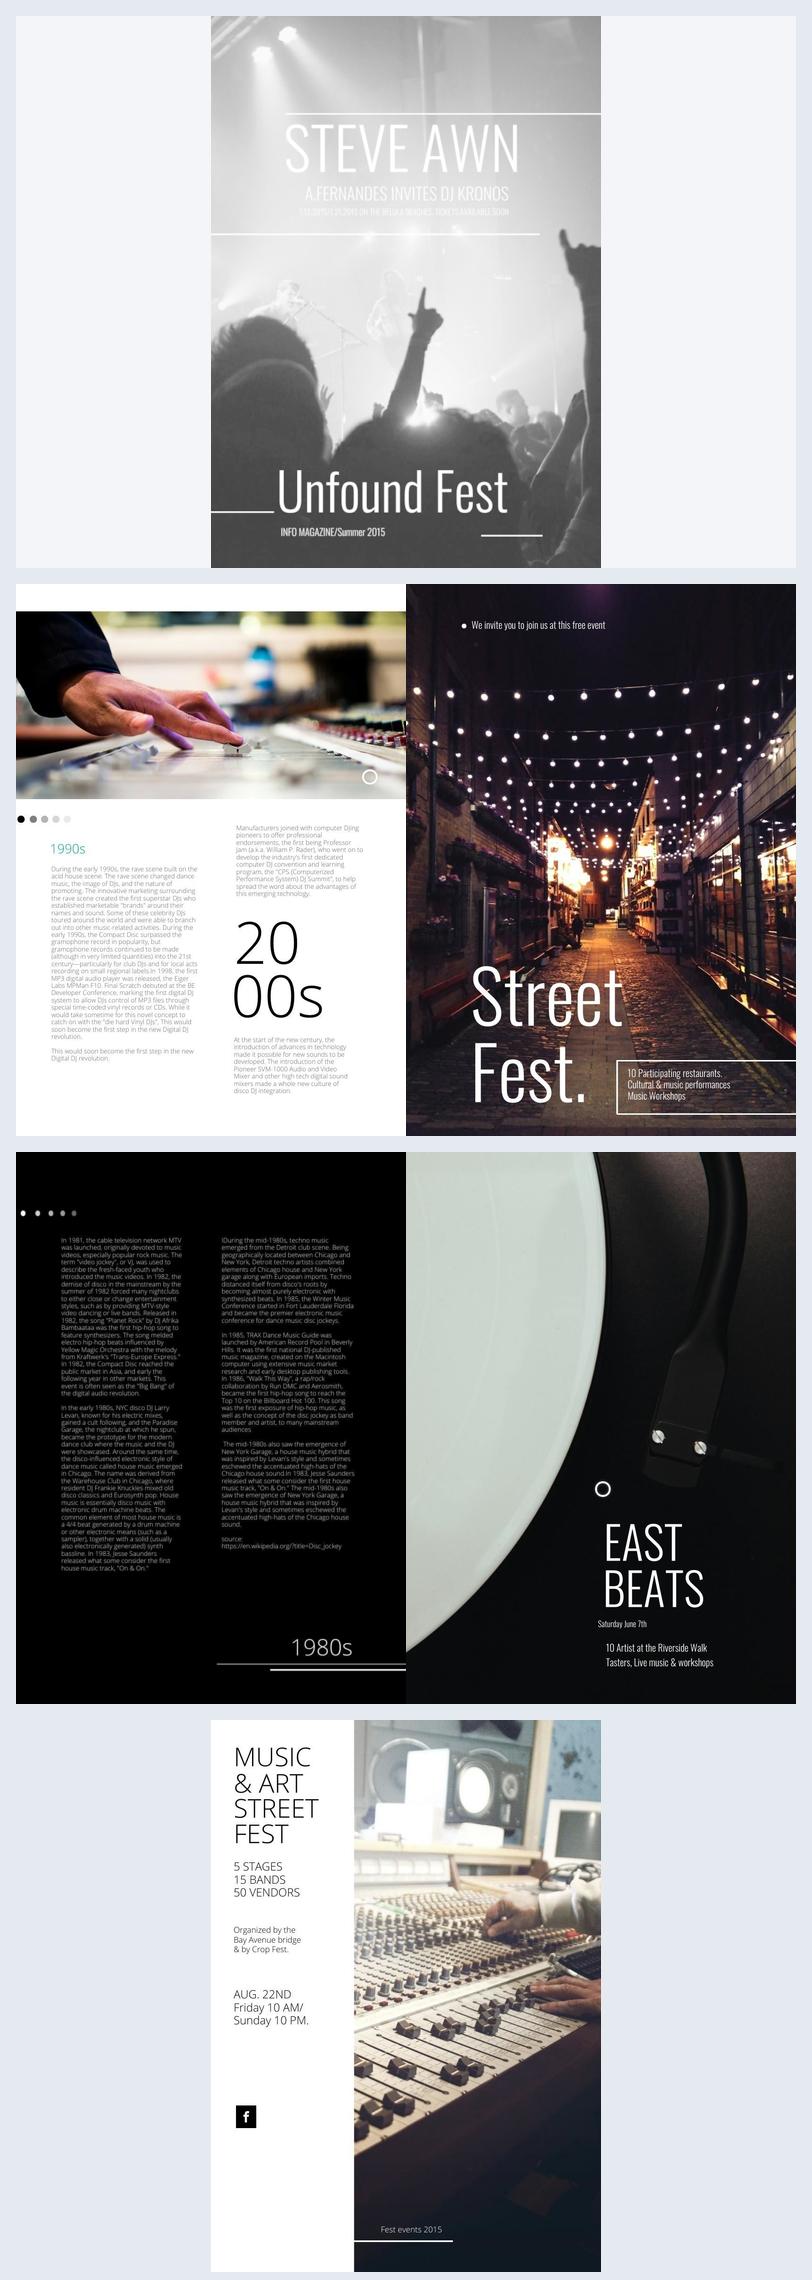 Musikfestival-Broschüre Design